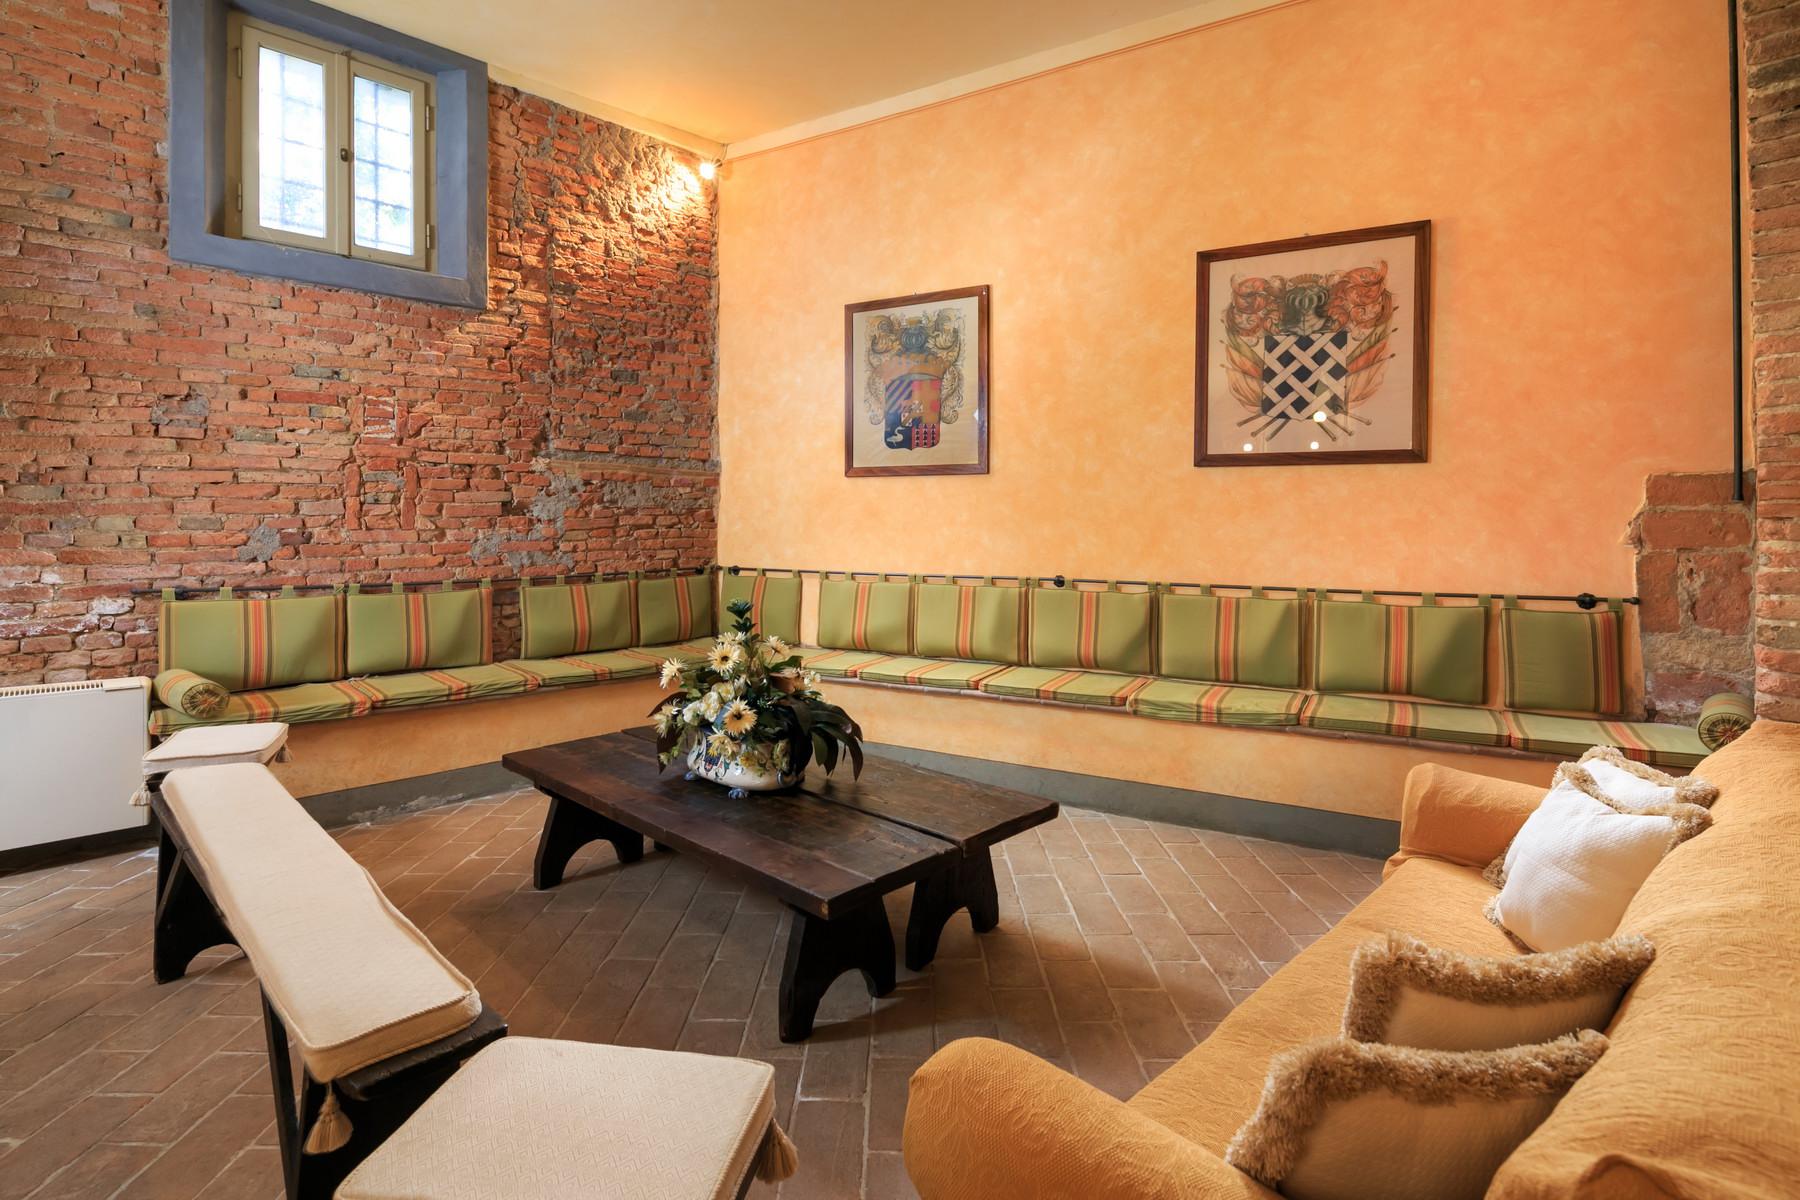 Villa in Vendita a Casciana Terme Lari: 5 locali, 550 mq - Foto 21